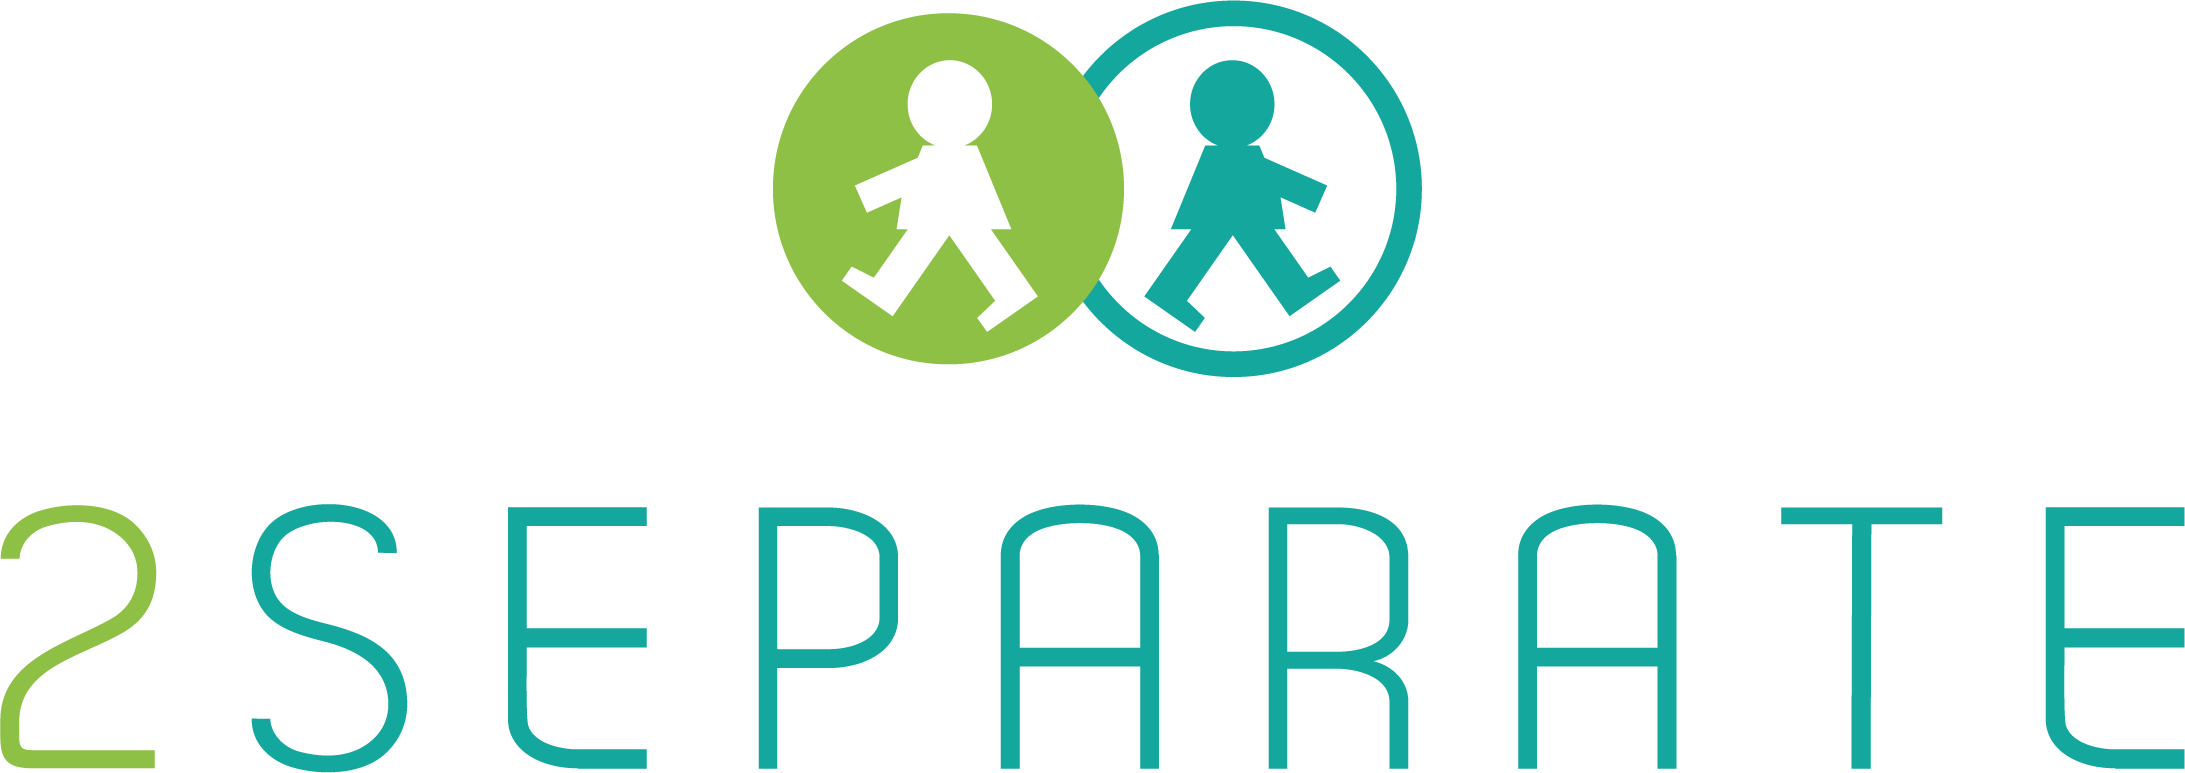 Logo 2Separate